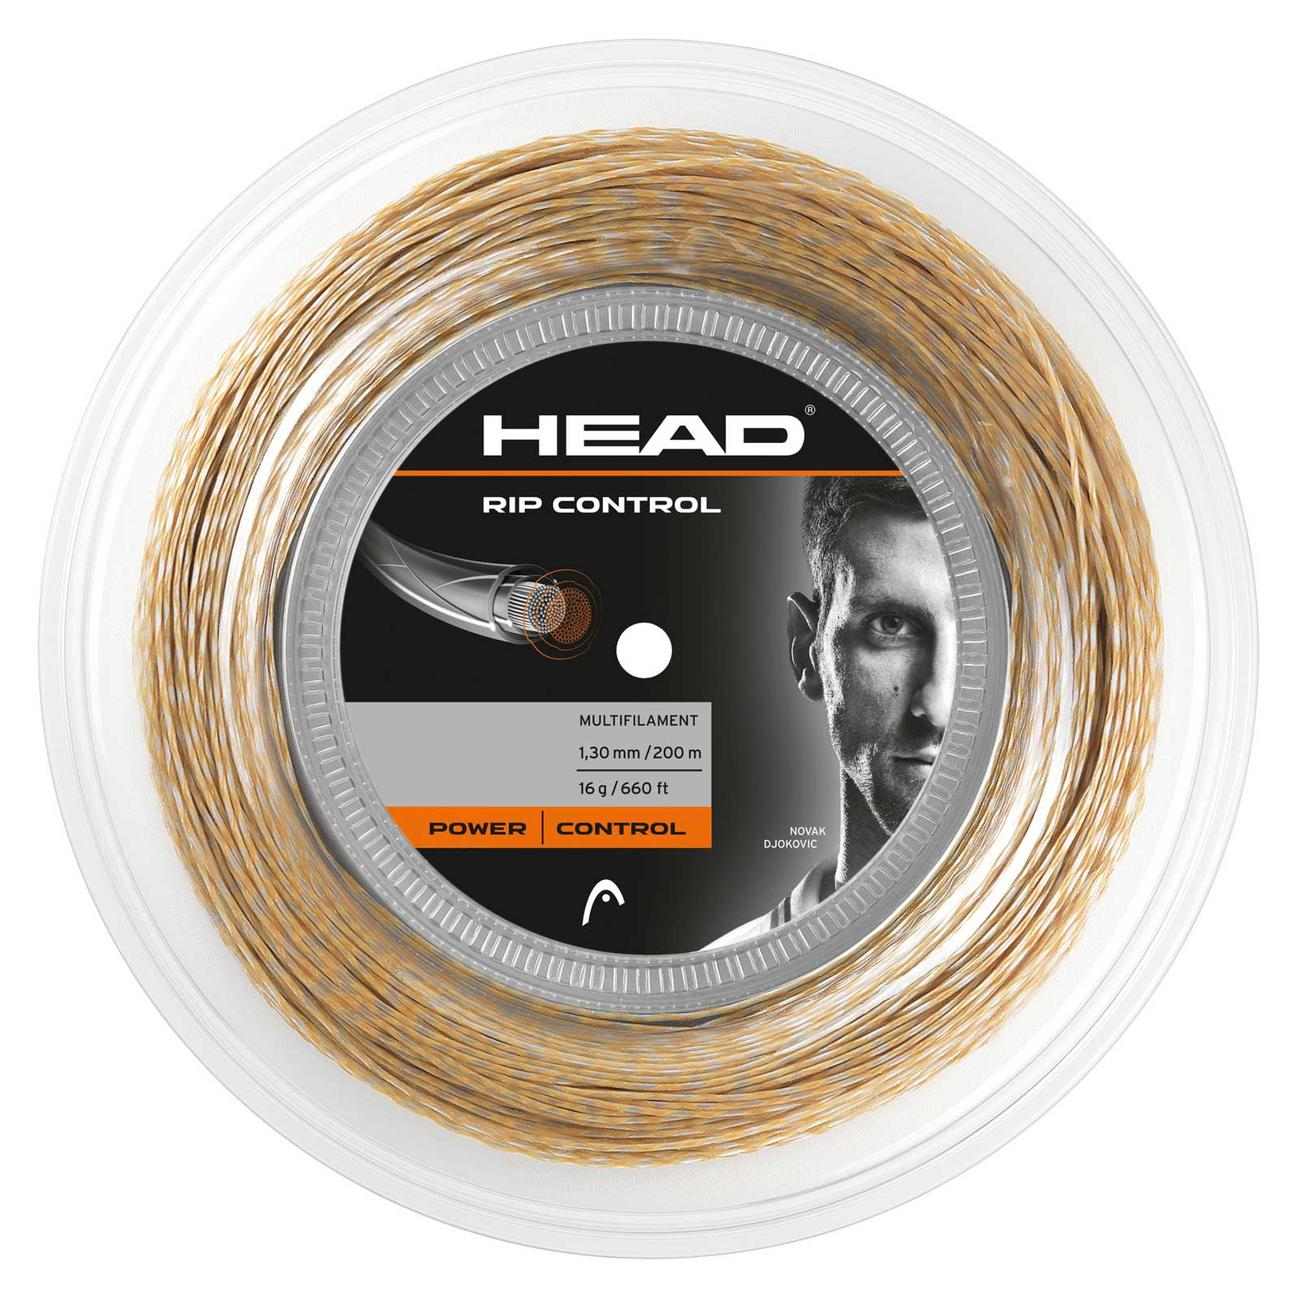 Racket Sports Head Rip Control 16 String 200m